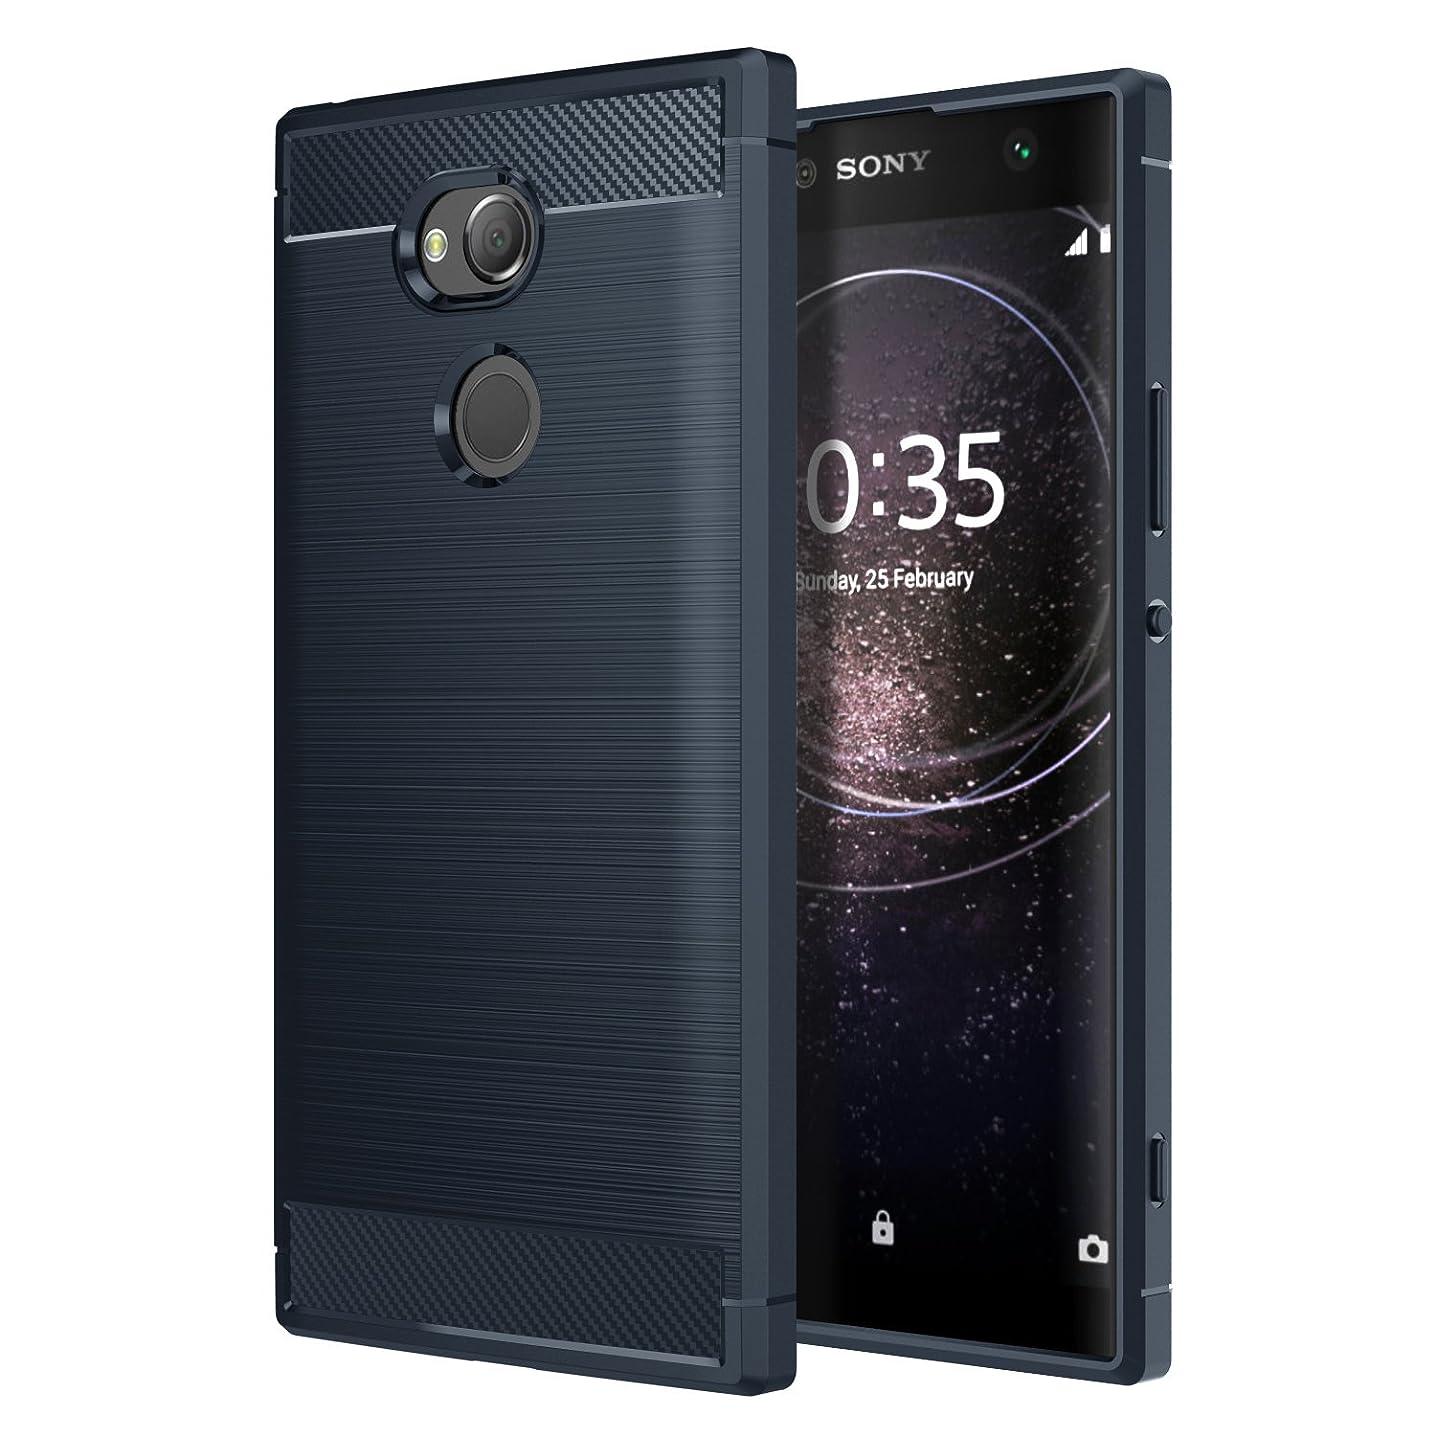 Sony Xperia XA2 Ultra Phone Case, MoKo Soft Lightweight TPU Bumper Cover Carbon Fiber Design Anti-Scratch Slim Back Panel Shock Aborsption Cellphone Shell for Sony Xperia XA2 Ultra 6 Inch, Indigo